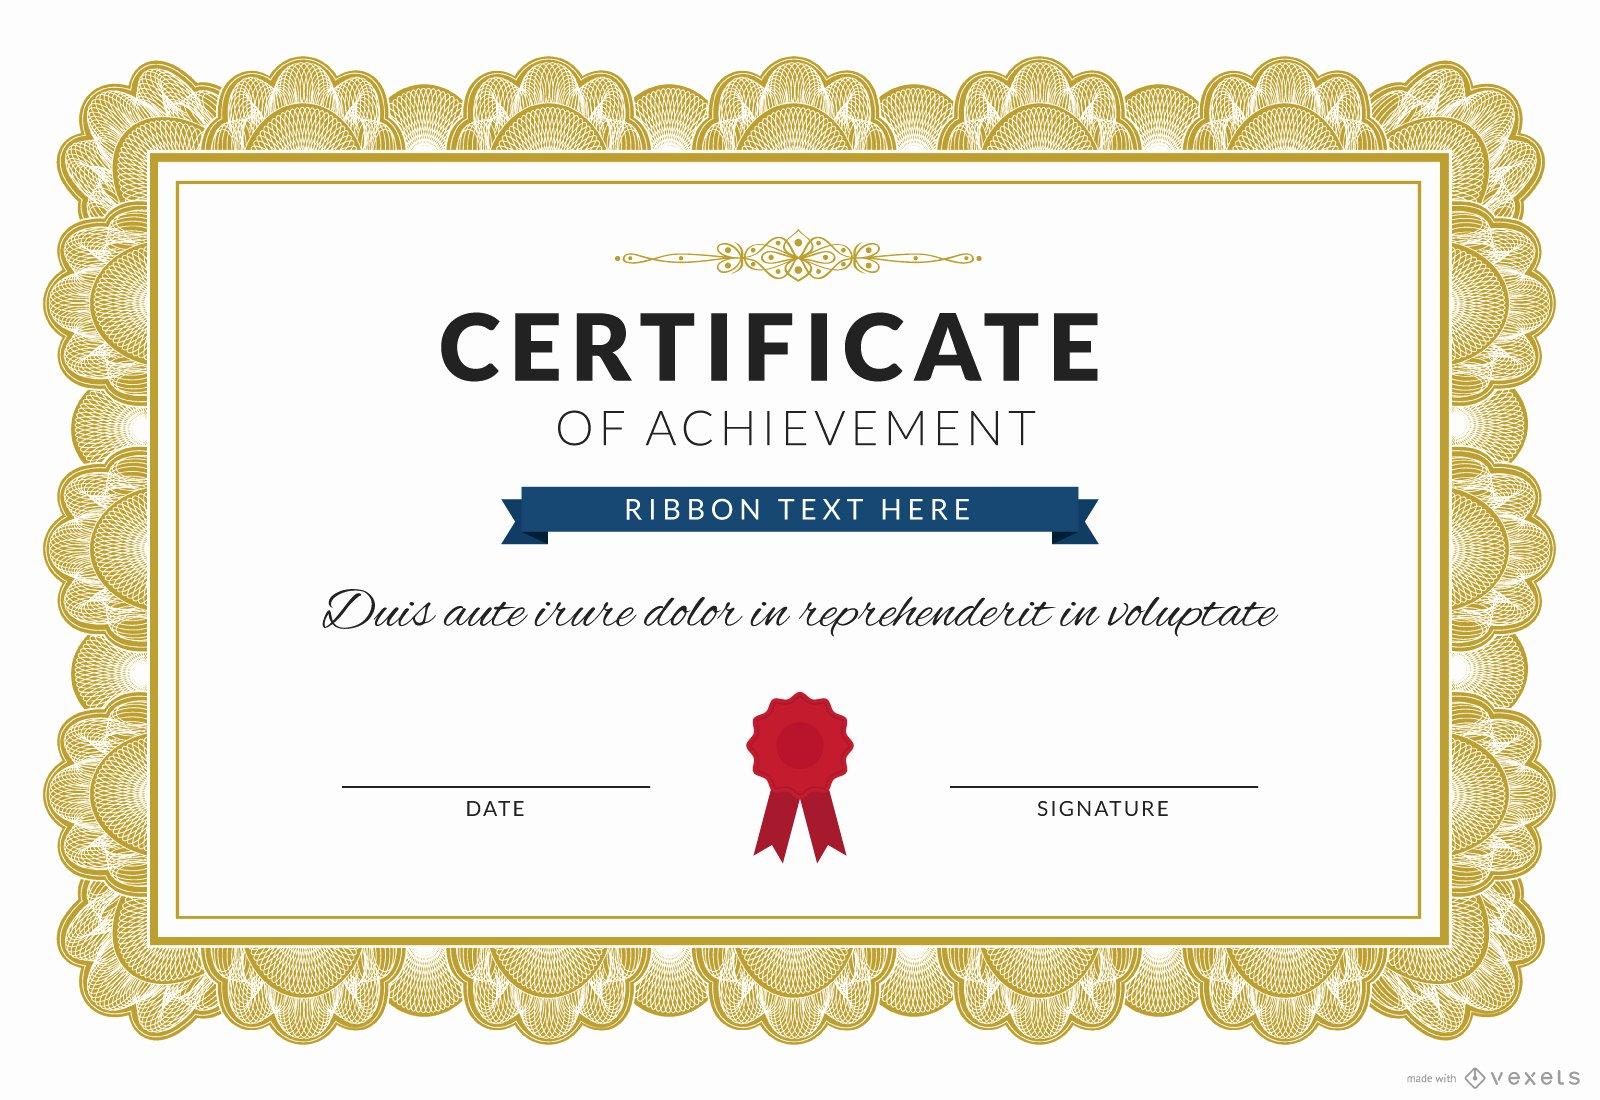 Certificate Of Achievement Elegant Certificate Of Achievement Maker Editable Design